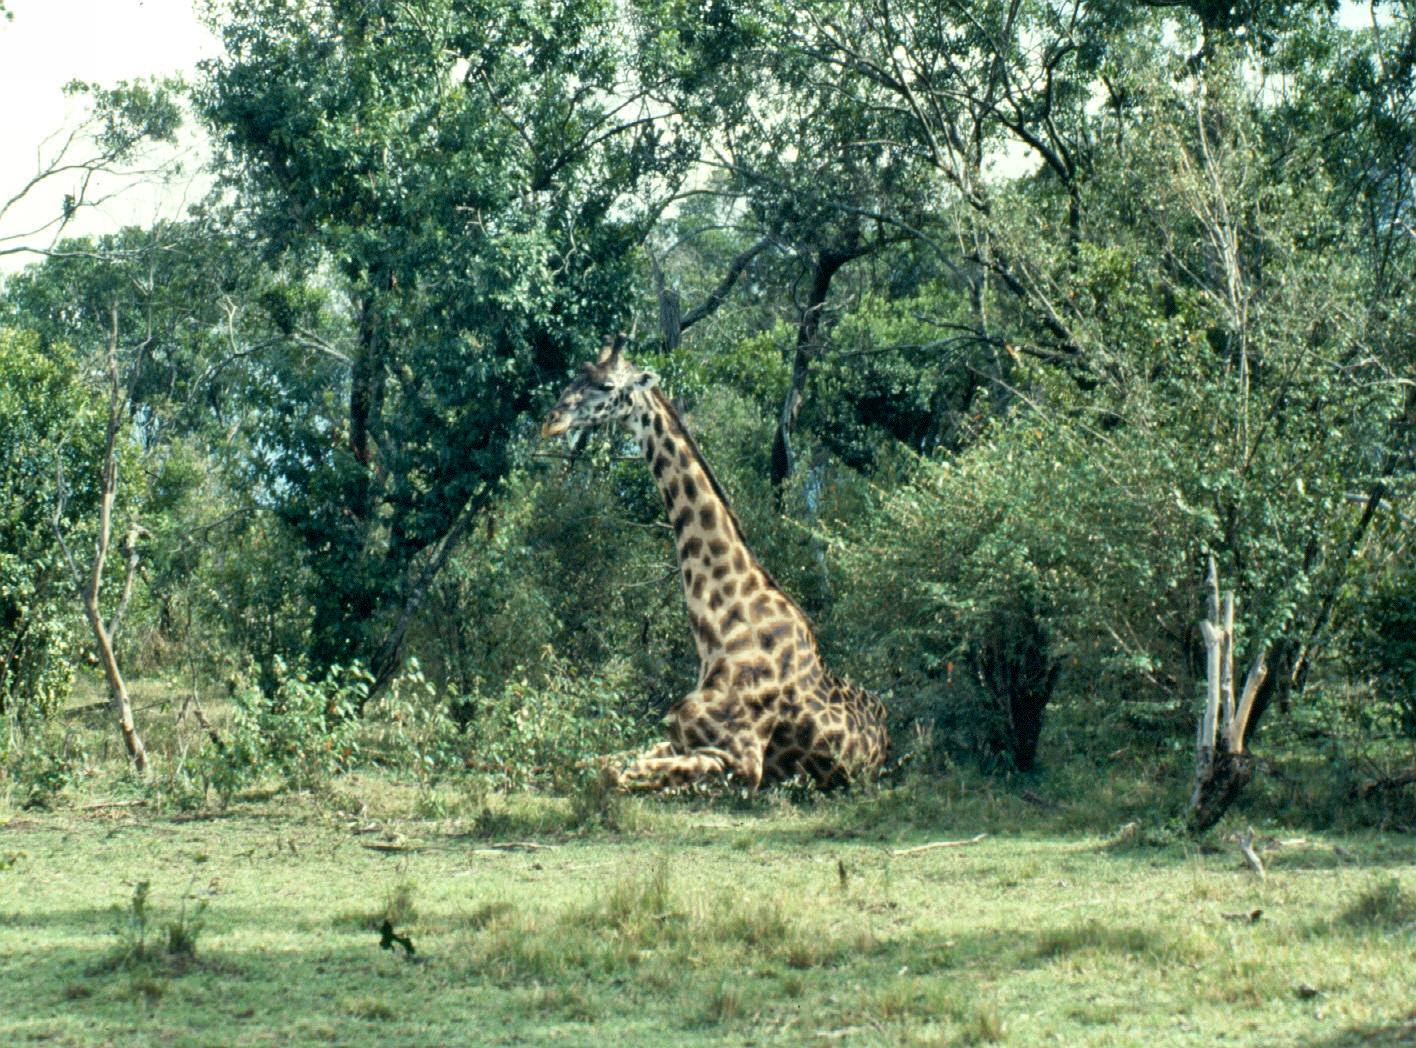 m mara sick giraffe...